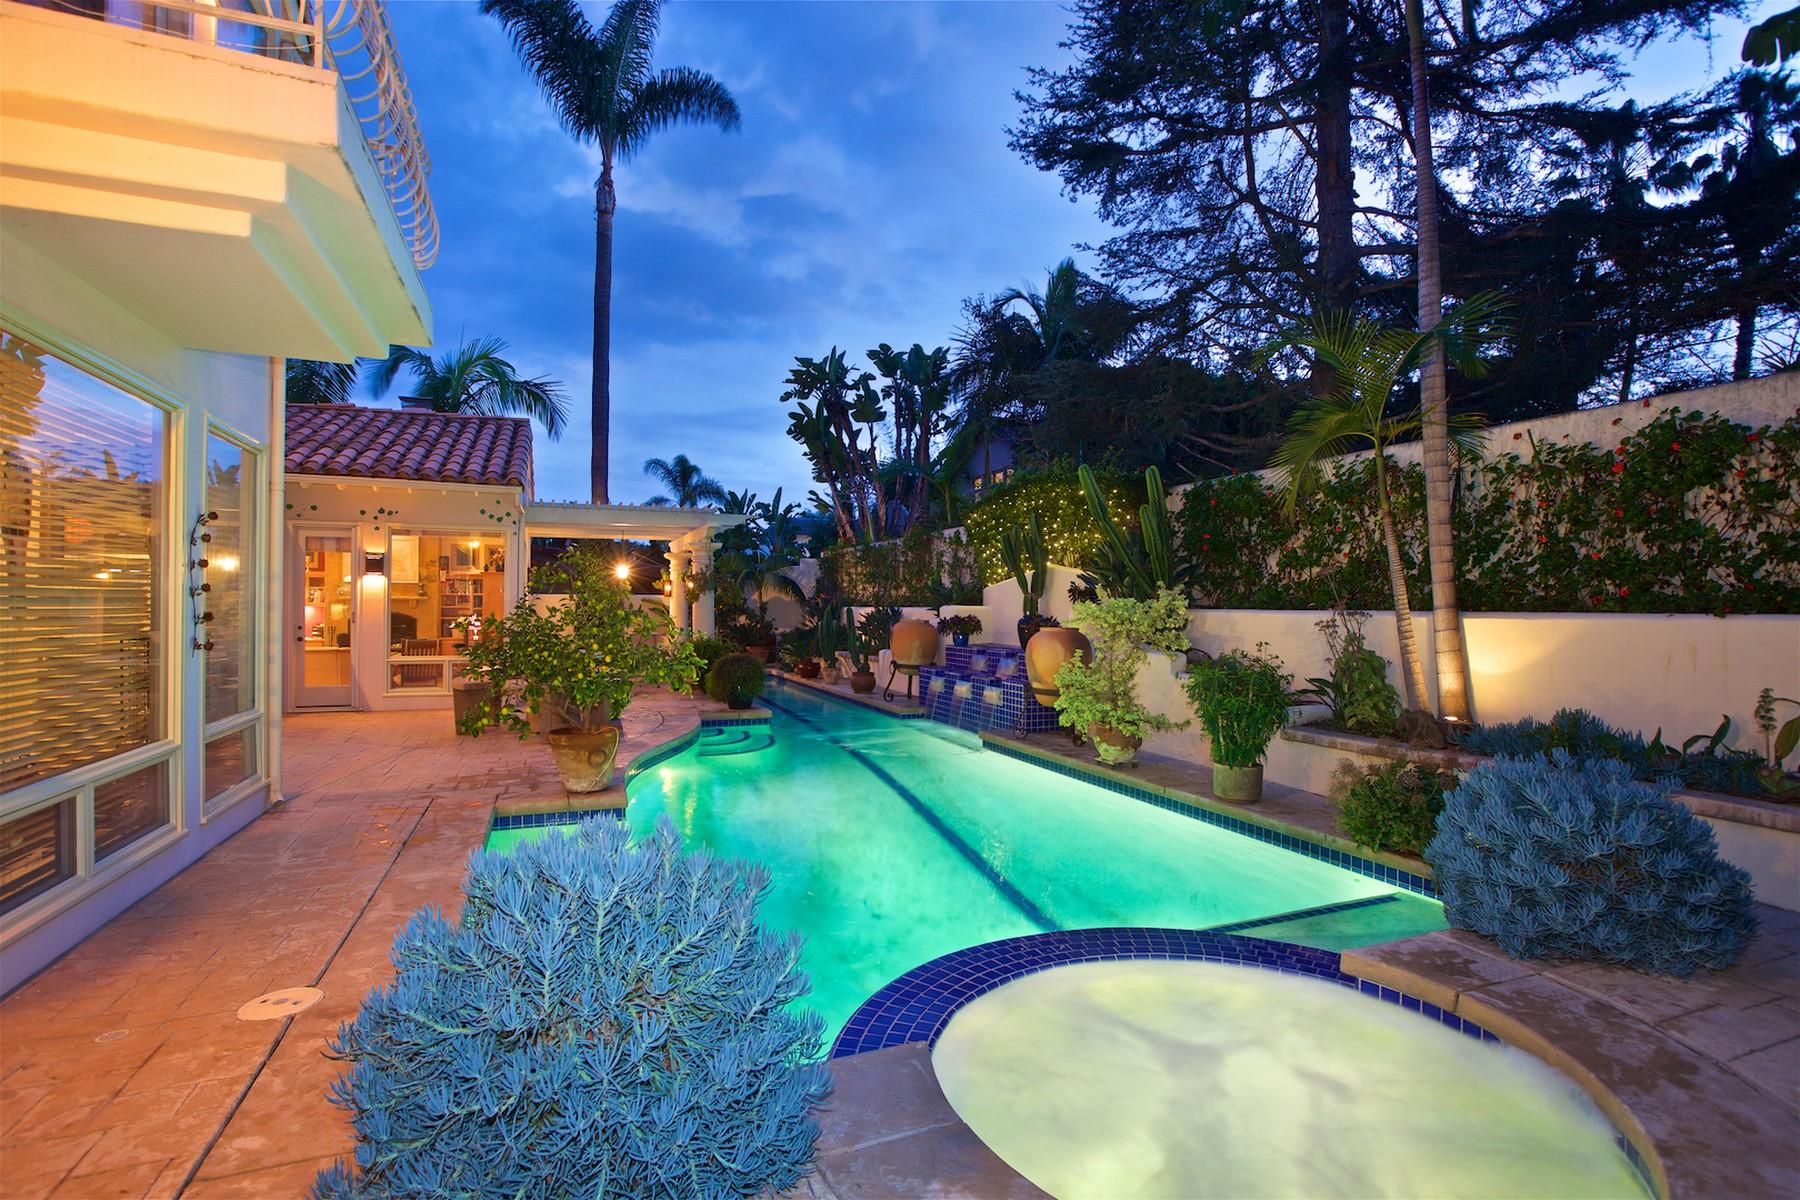 Single Family Home for Sale at 664 Hymettus Avenue Encinitas, California 92024 United States